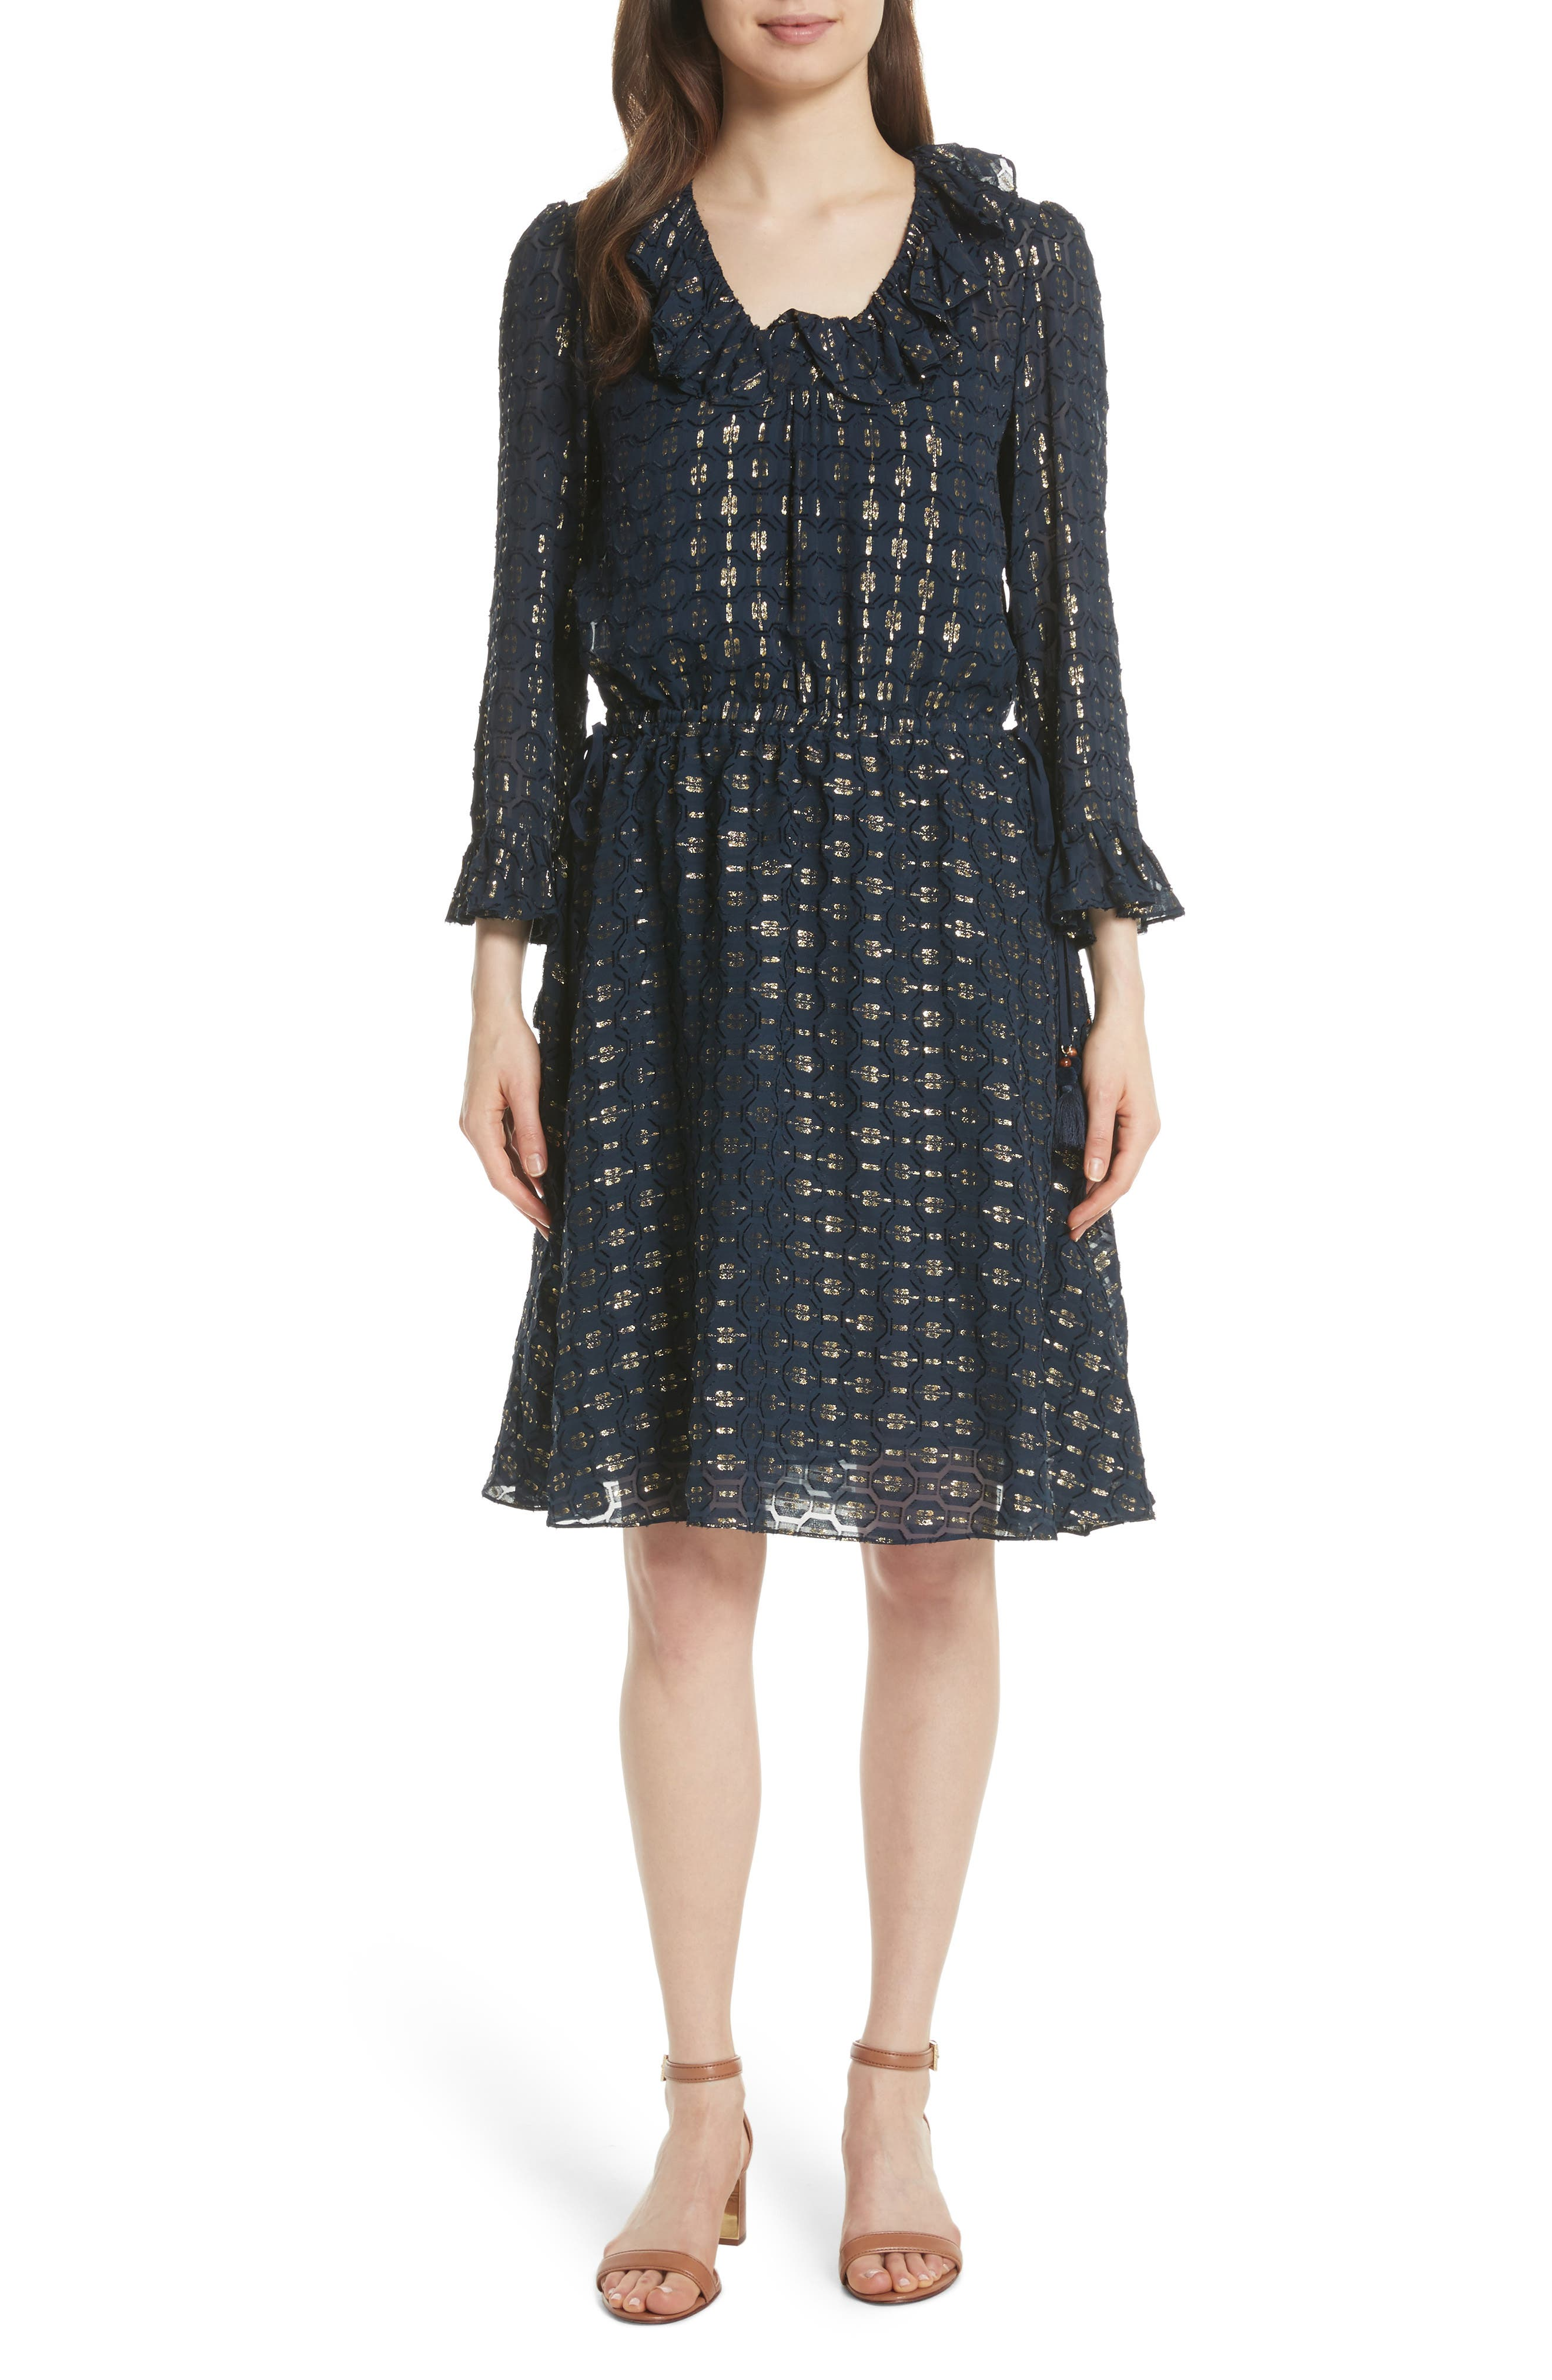 TORY BURCH,                             Jasmine Silk Blend Dress,                             Main thumbnail 1, color,                             405